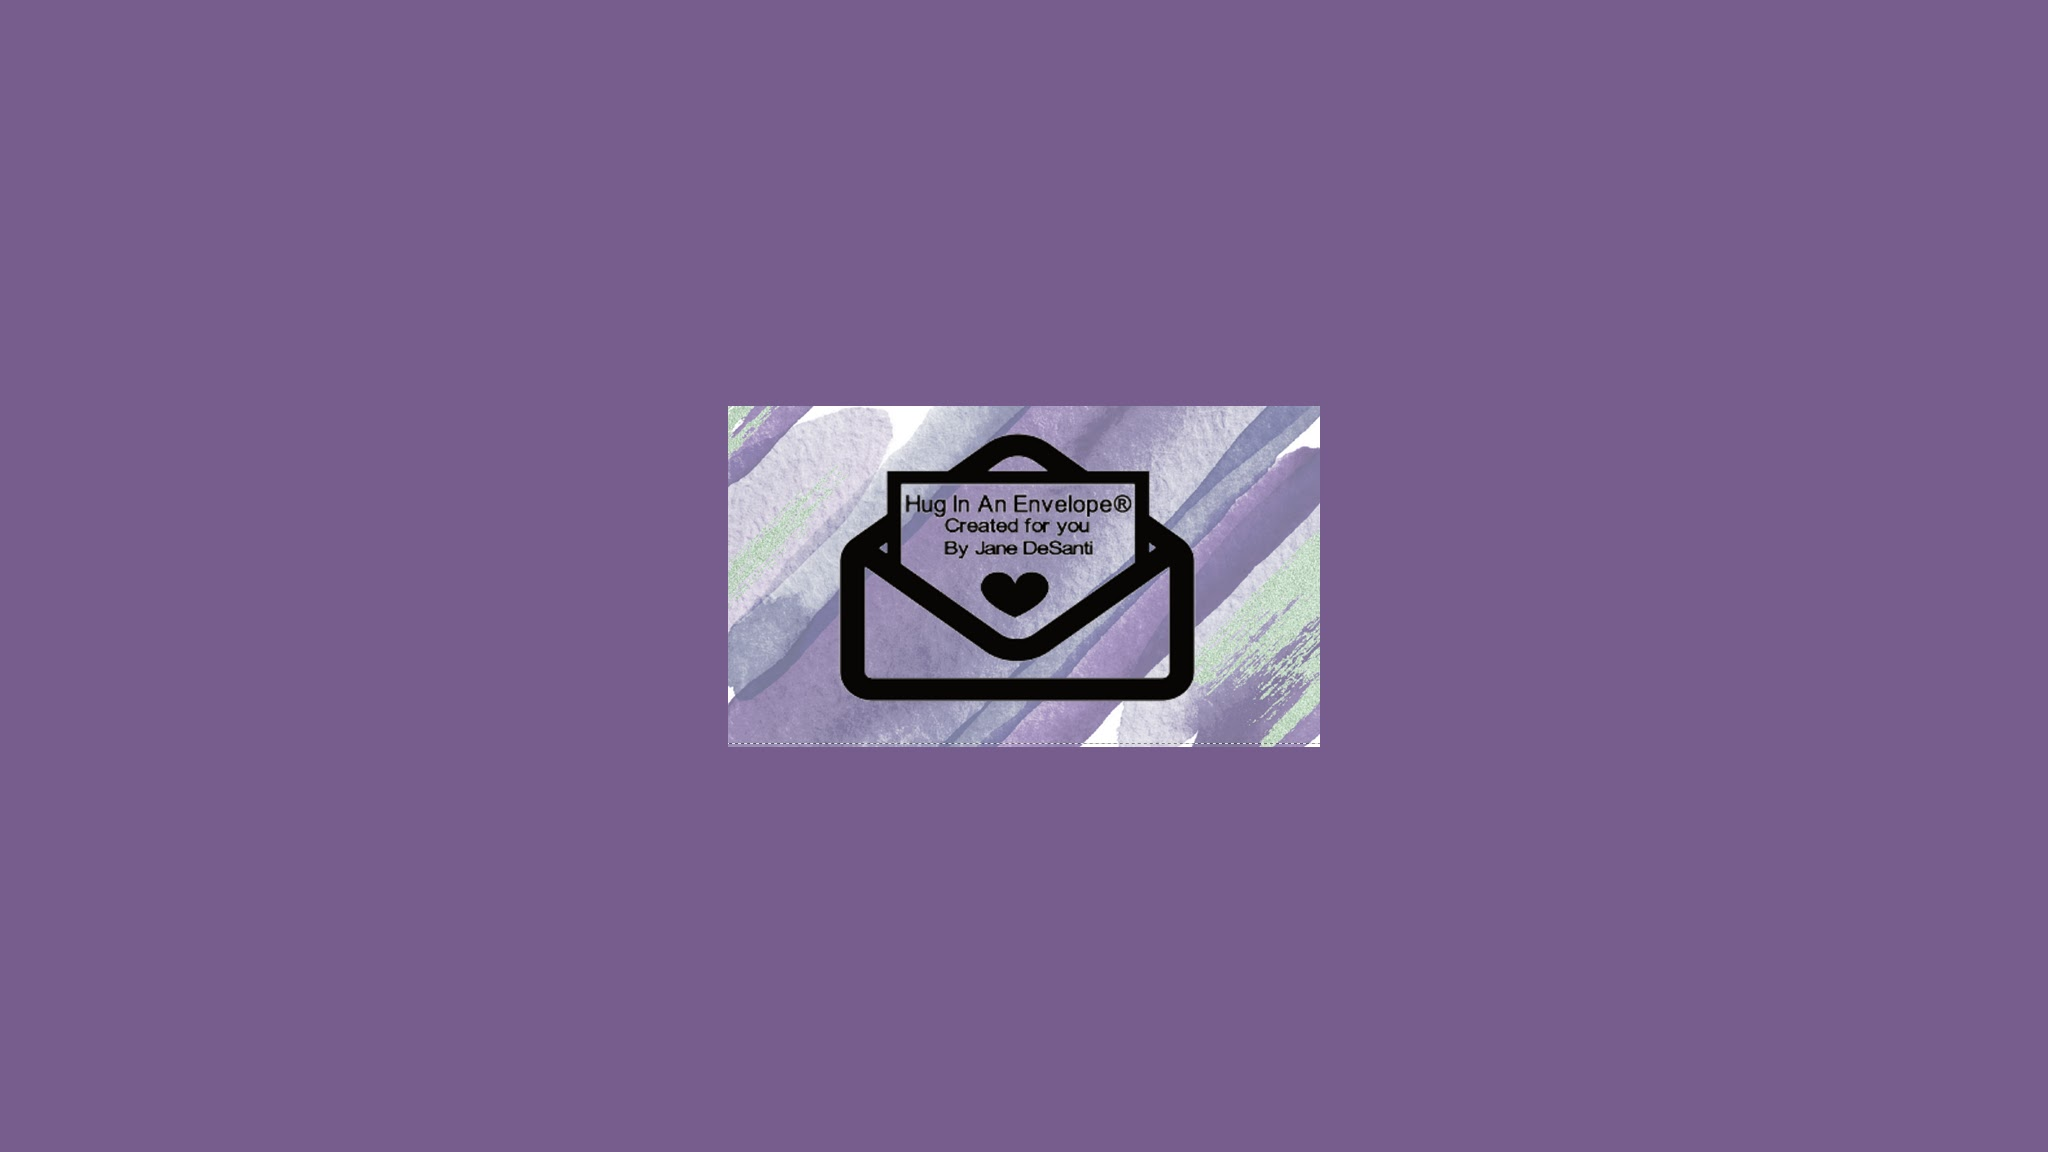 Hug In An Envelope By Jane DeSanti